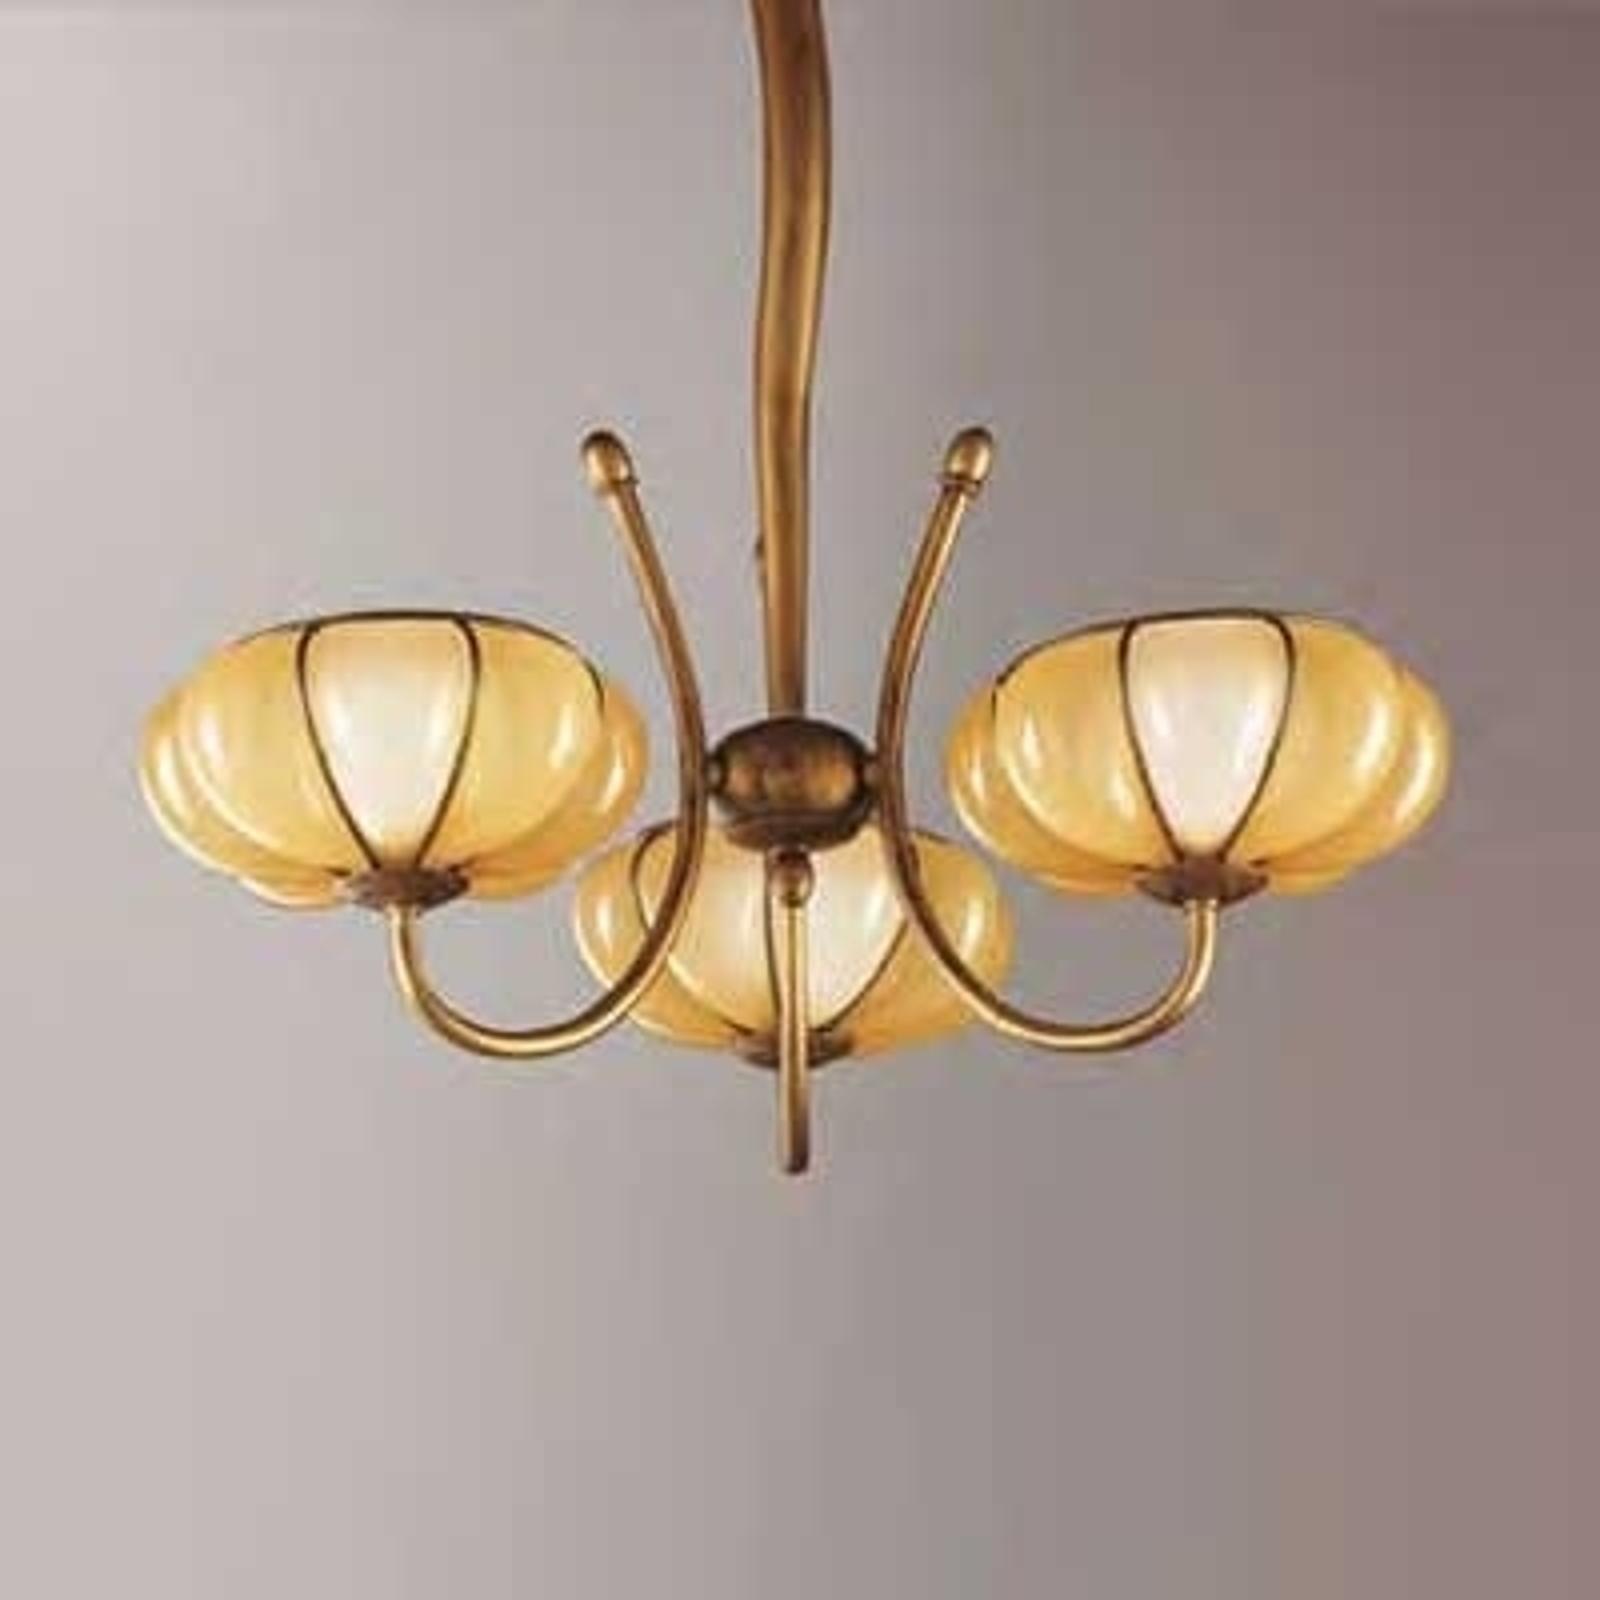 LOTO klassisk taklampe